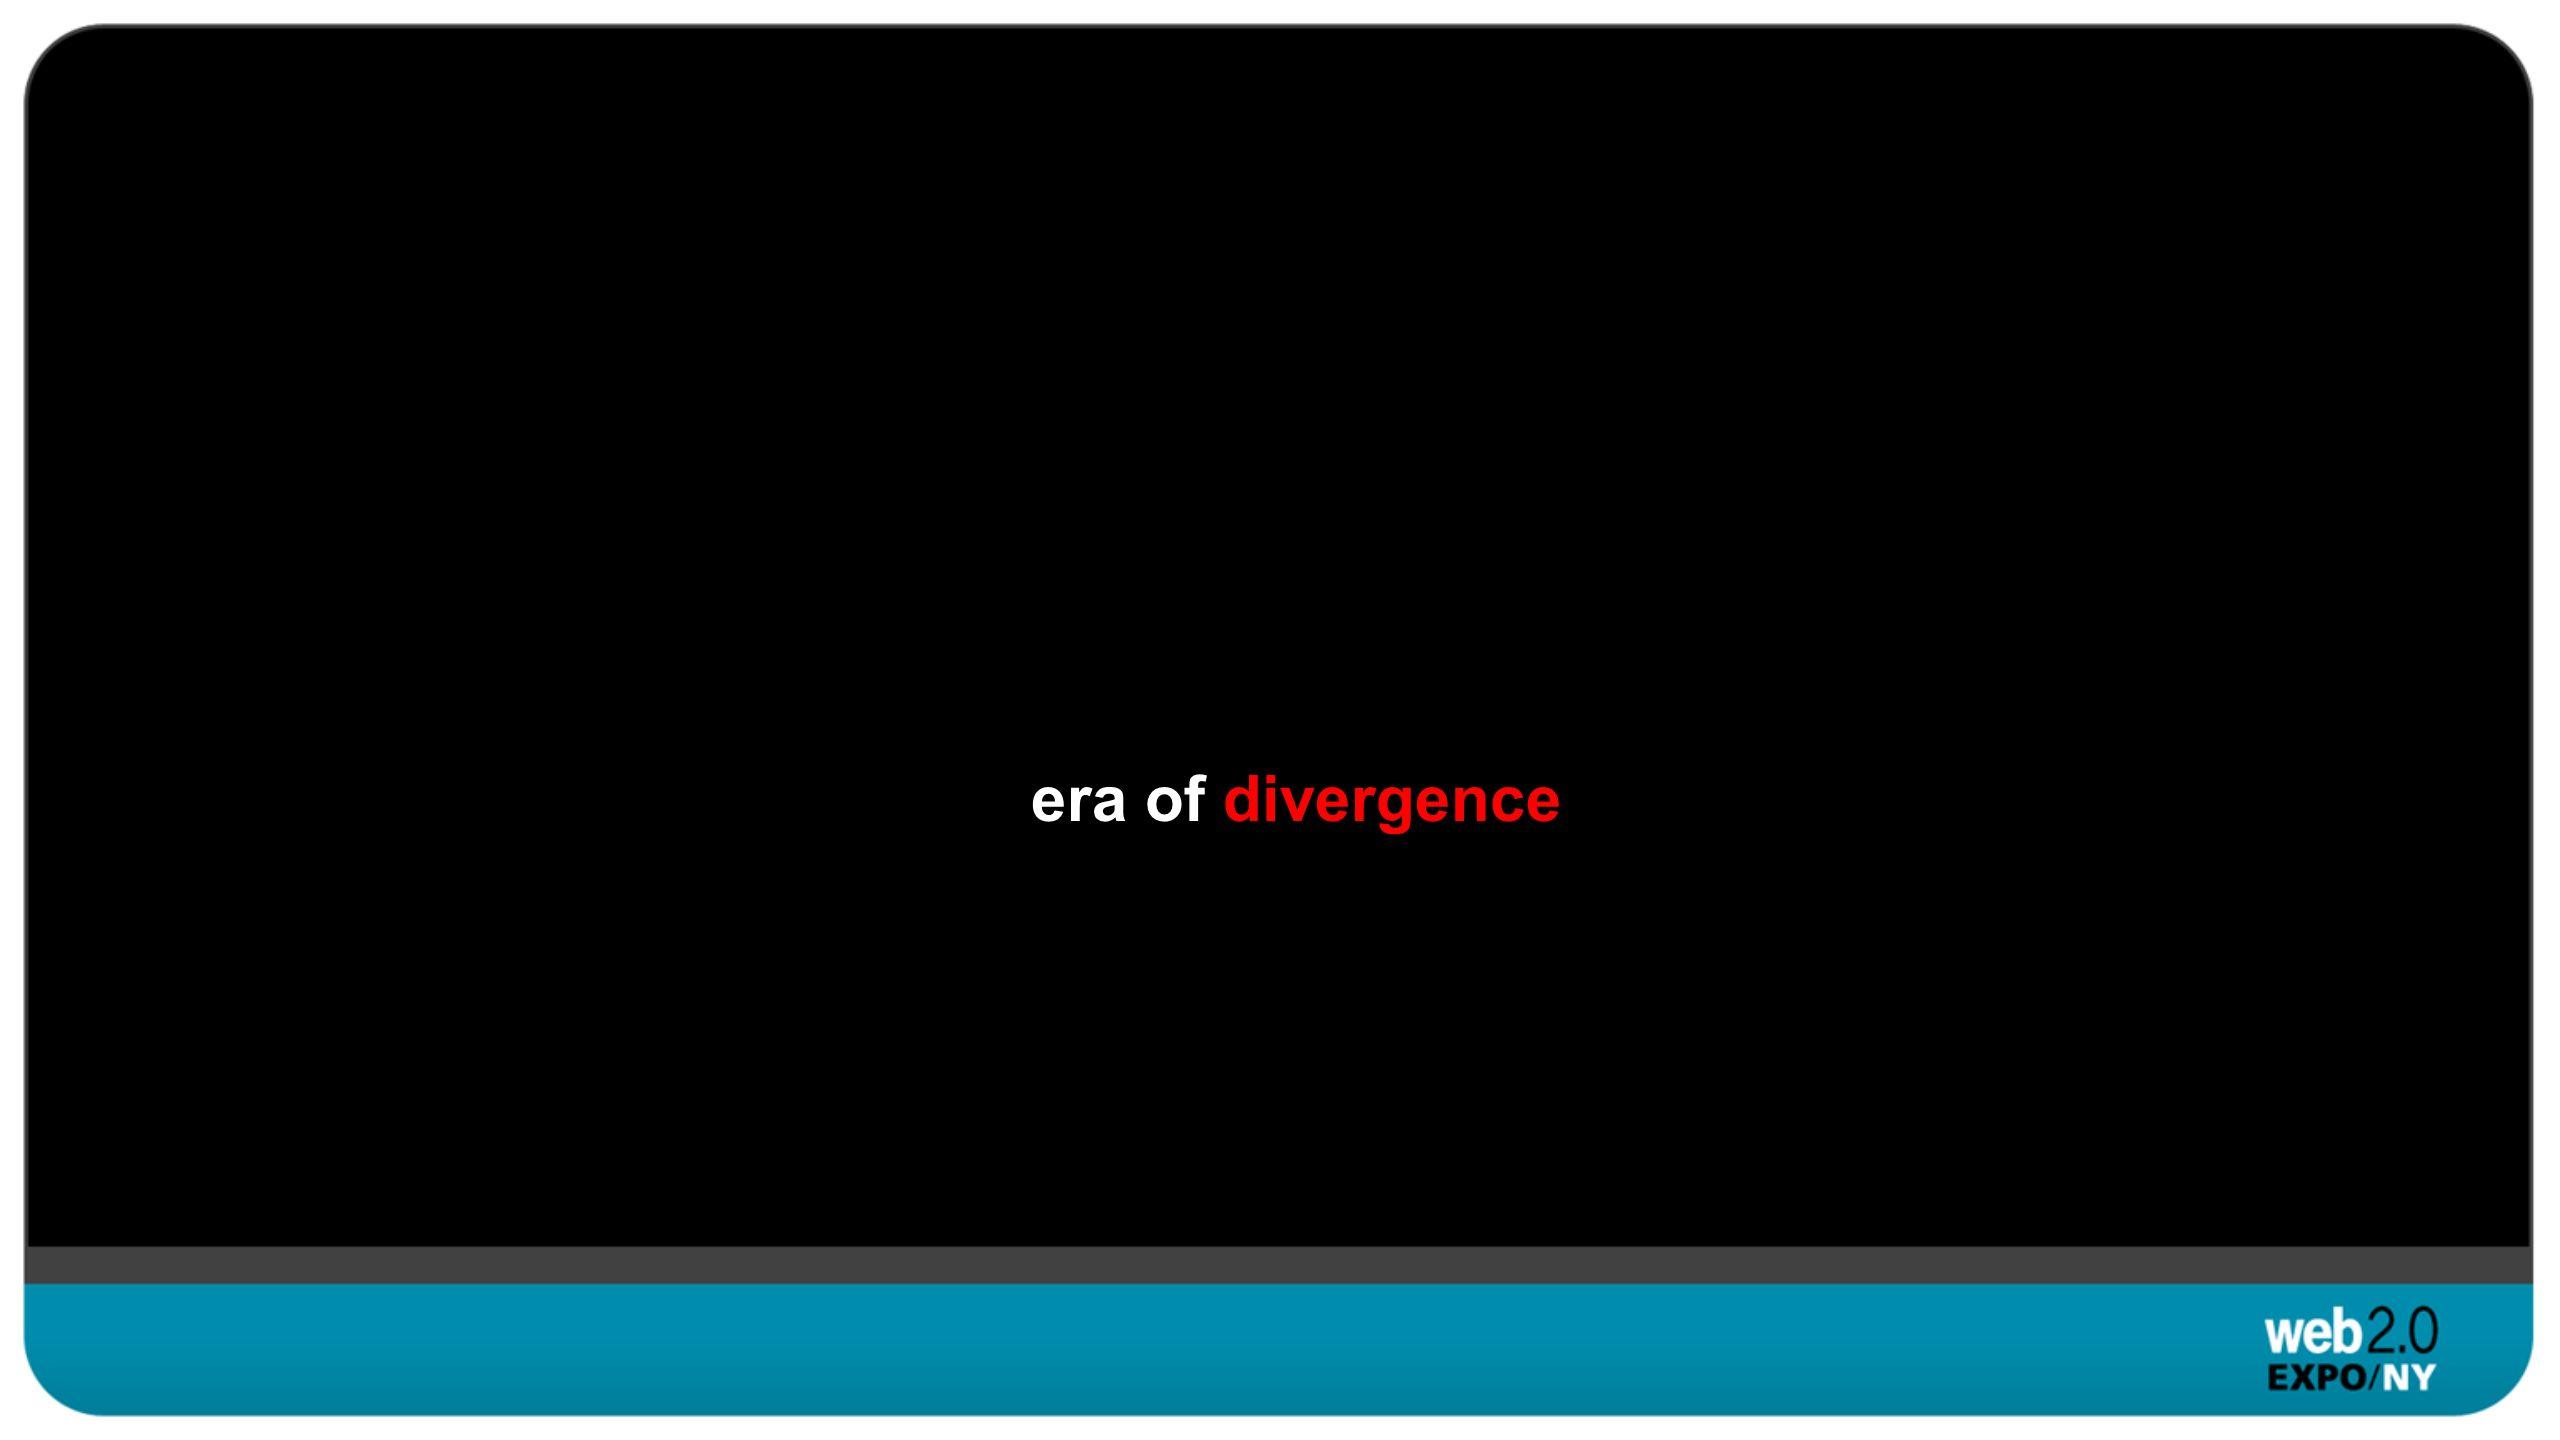 era of divergence